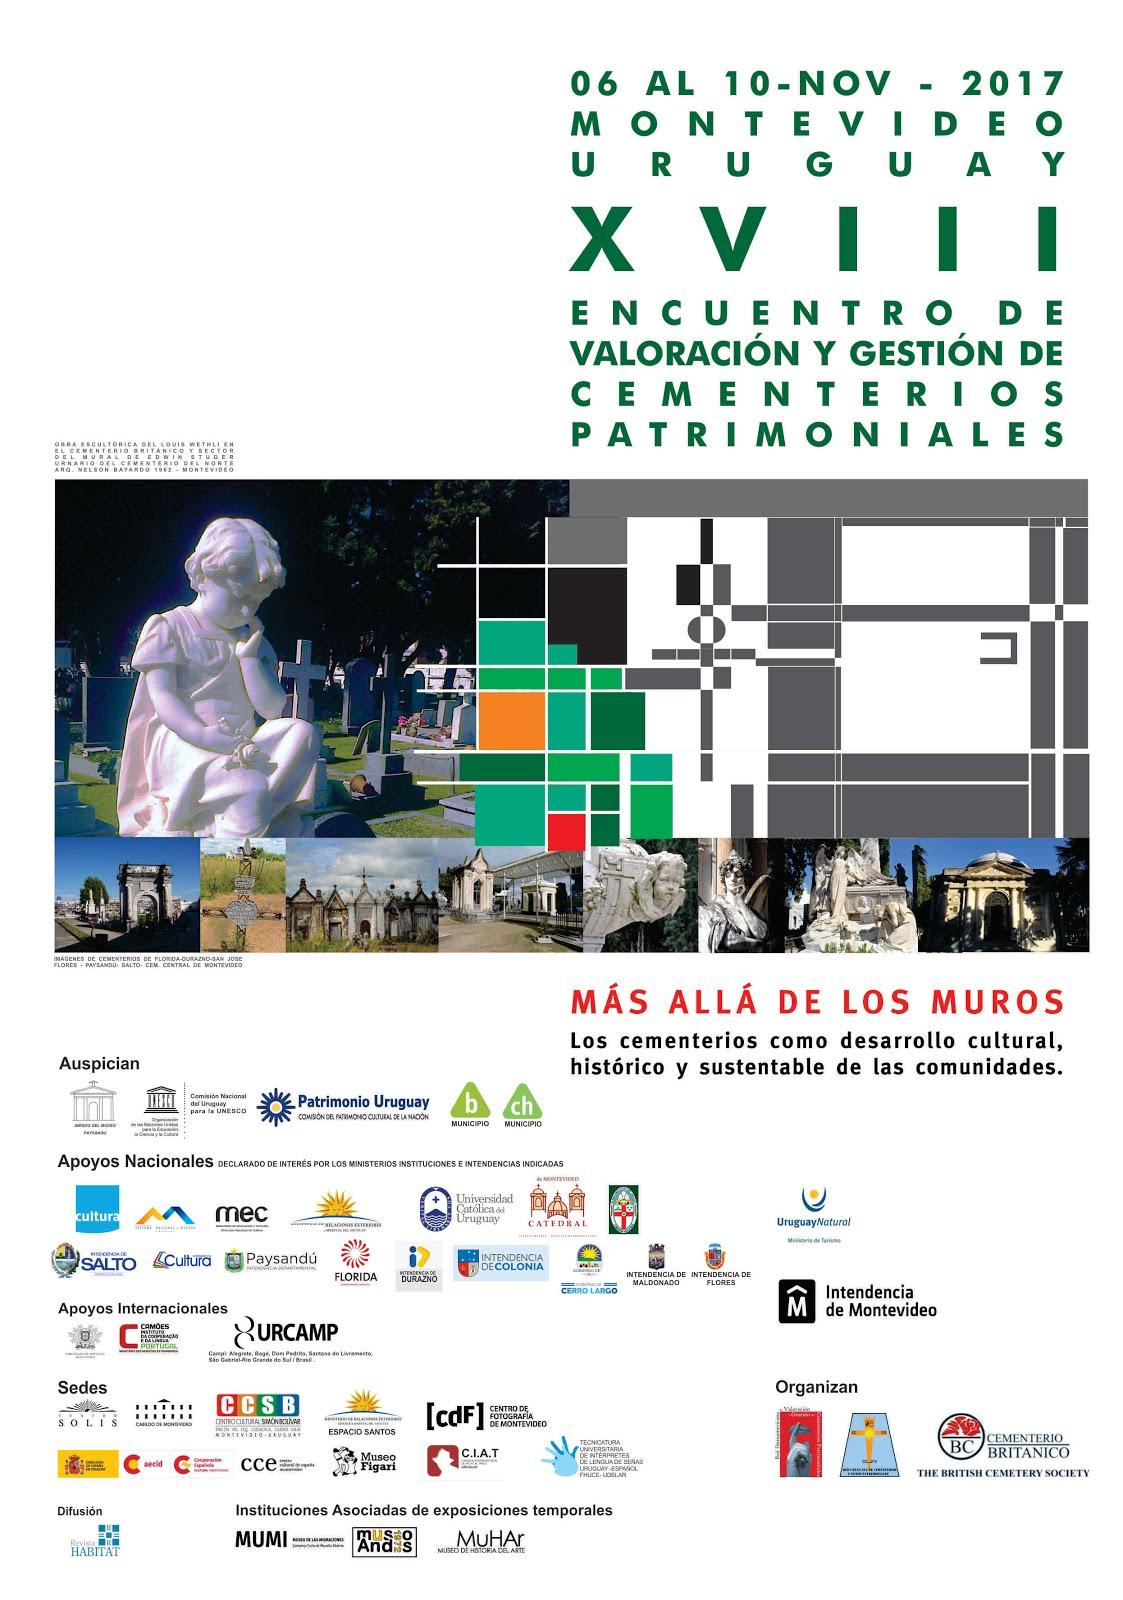 Convocatoria oficial XVIII Encuentro Iberoamericano de Cementerios Patrimoniales